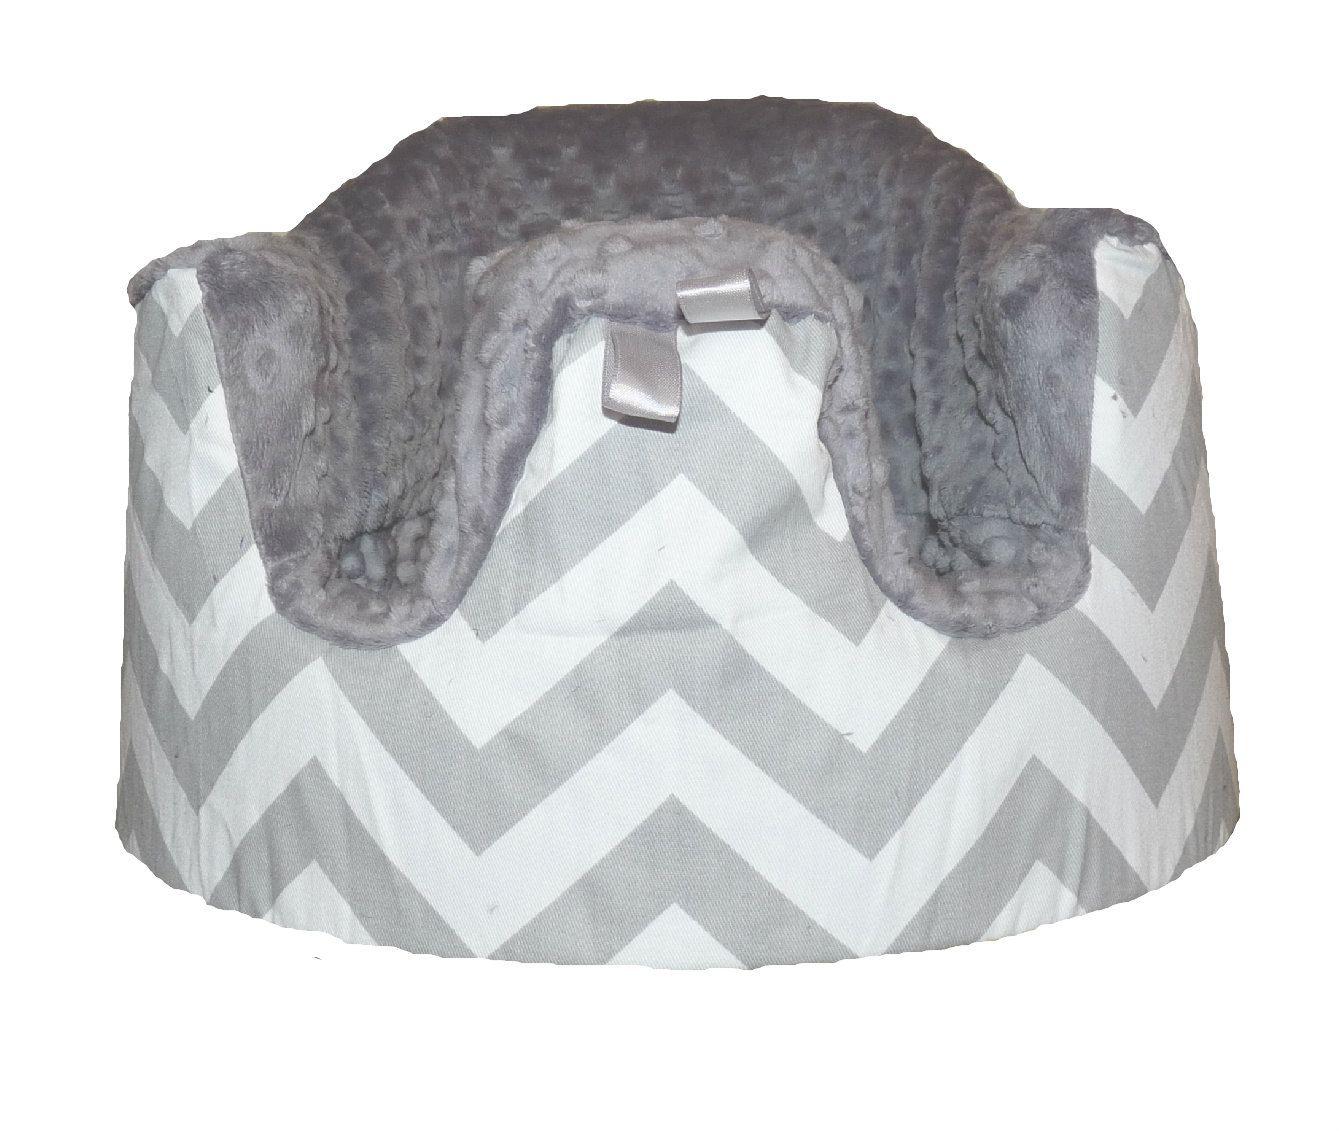 Bumbo Seat COVER in Chevron Gray | Baby | Pinterest | Bebe, Ropa ...